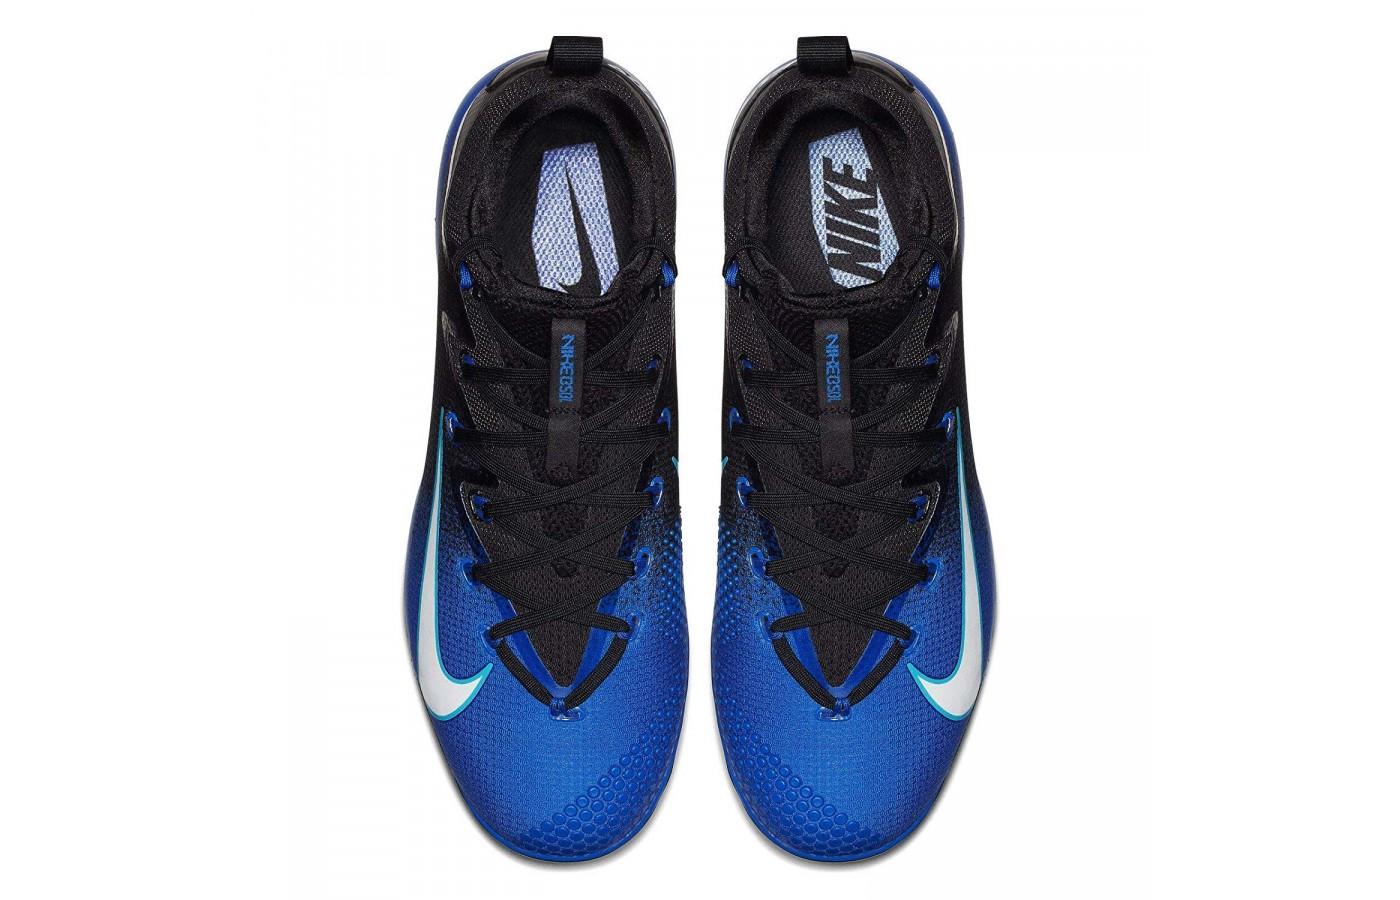 Nike Lunar Vapor Ultrafly  pair